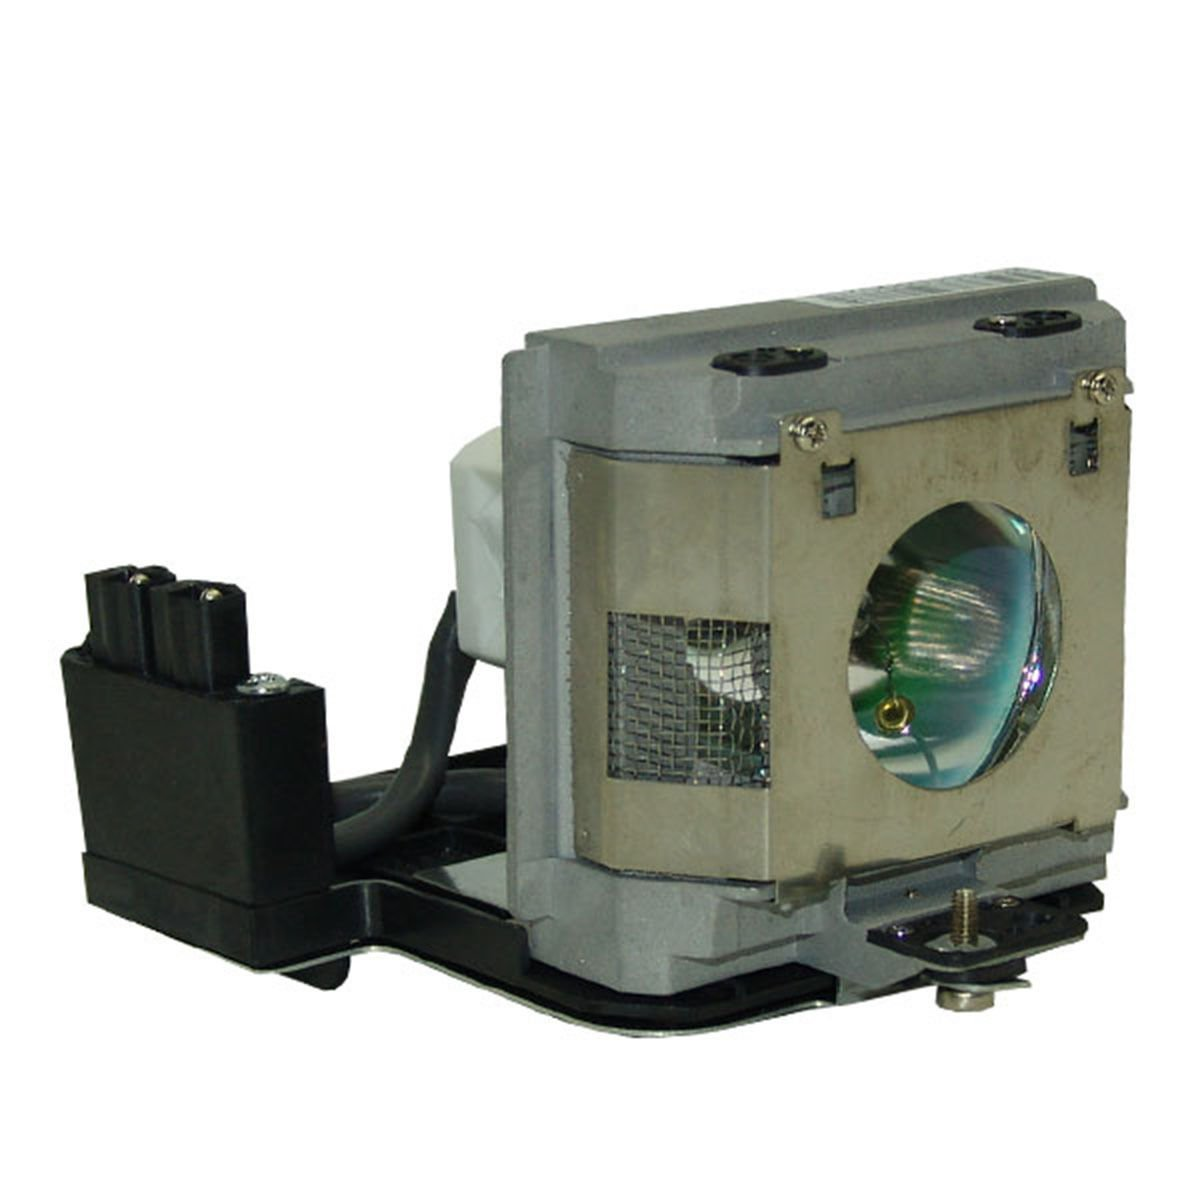 Supermait AN-K2LP プロジェクター交換用ランプ 汎用バルブ + 汎用ハウジング 150日間安心保証つき 適用機種: DT-400/XV-Z2000/XV-Z2000E 対応   B0775FZ72V